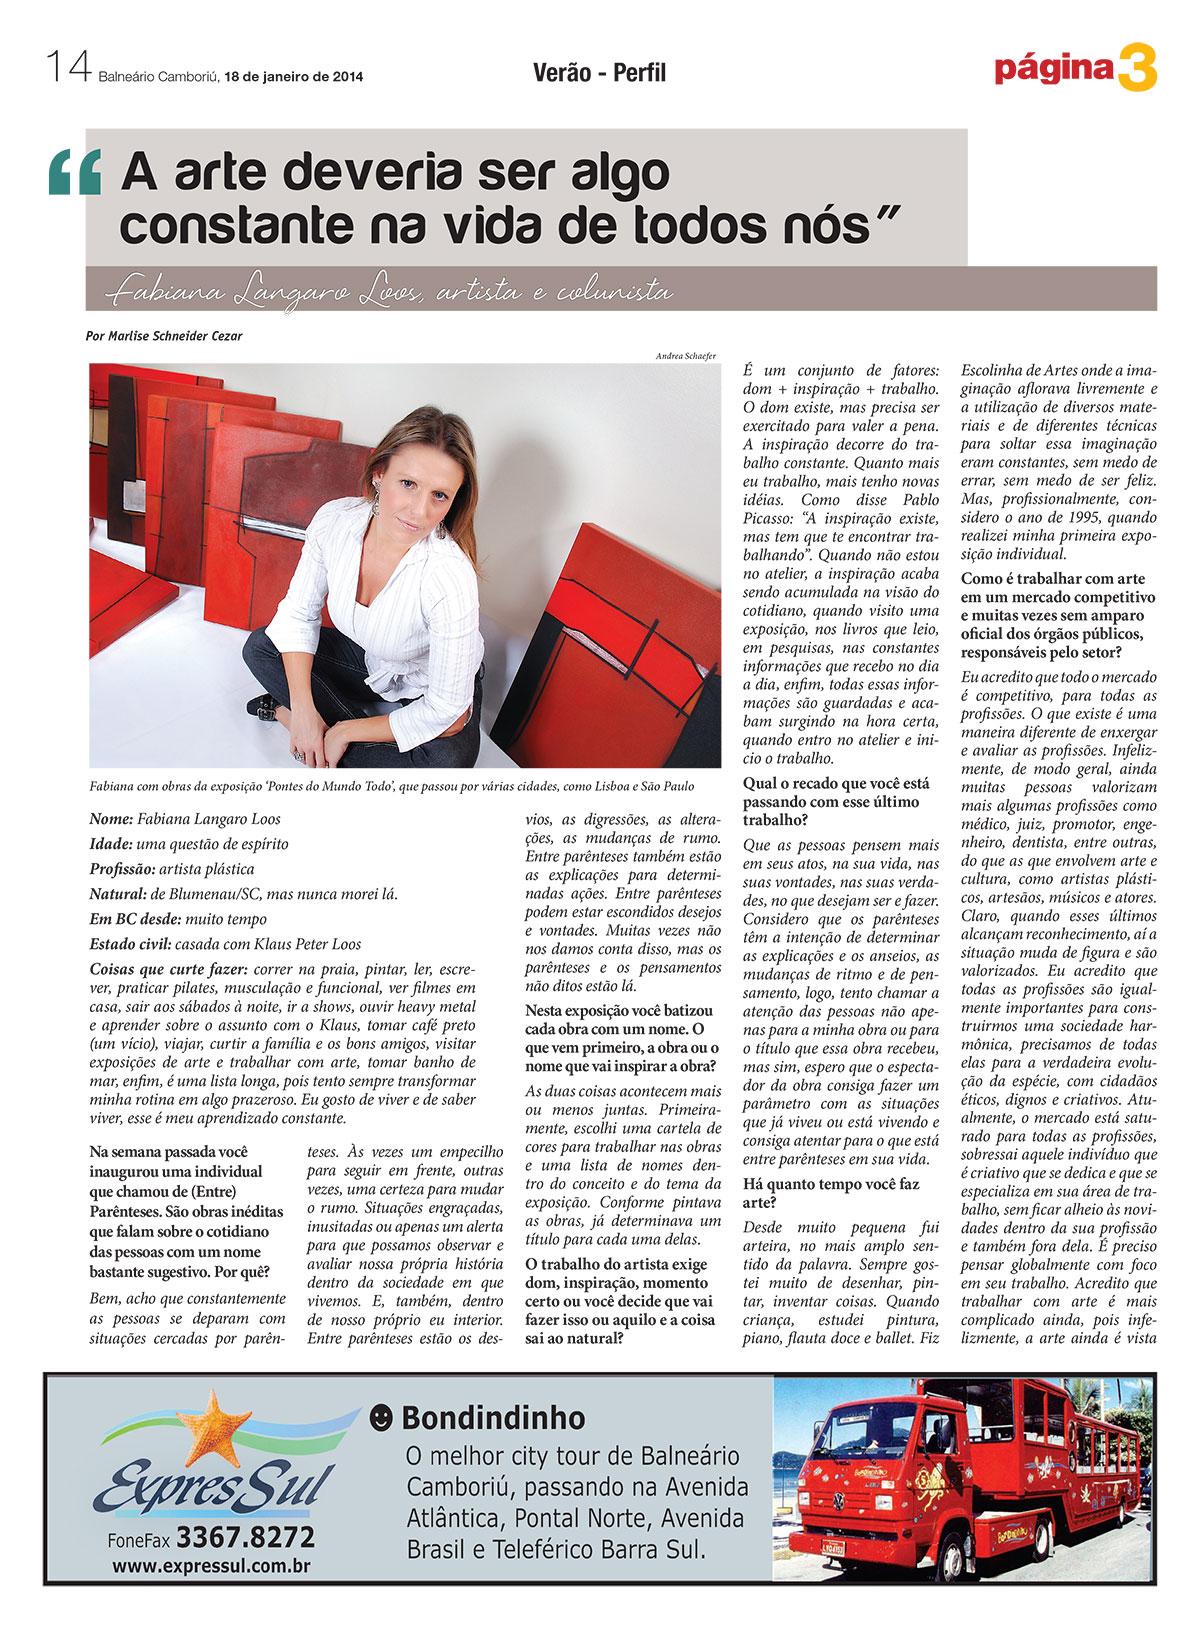 Jornal-Página-3---Perfil-com-Fabiana-Langaro-Loos---pág-14